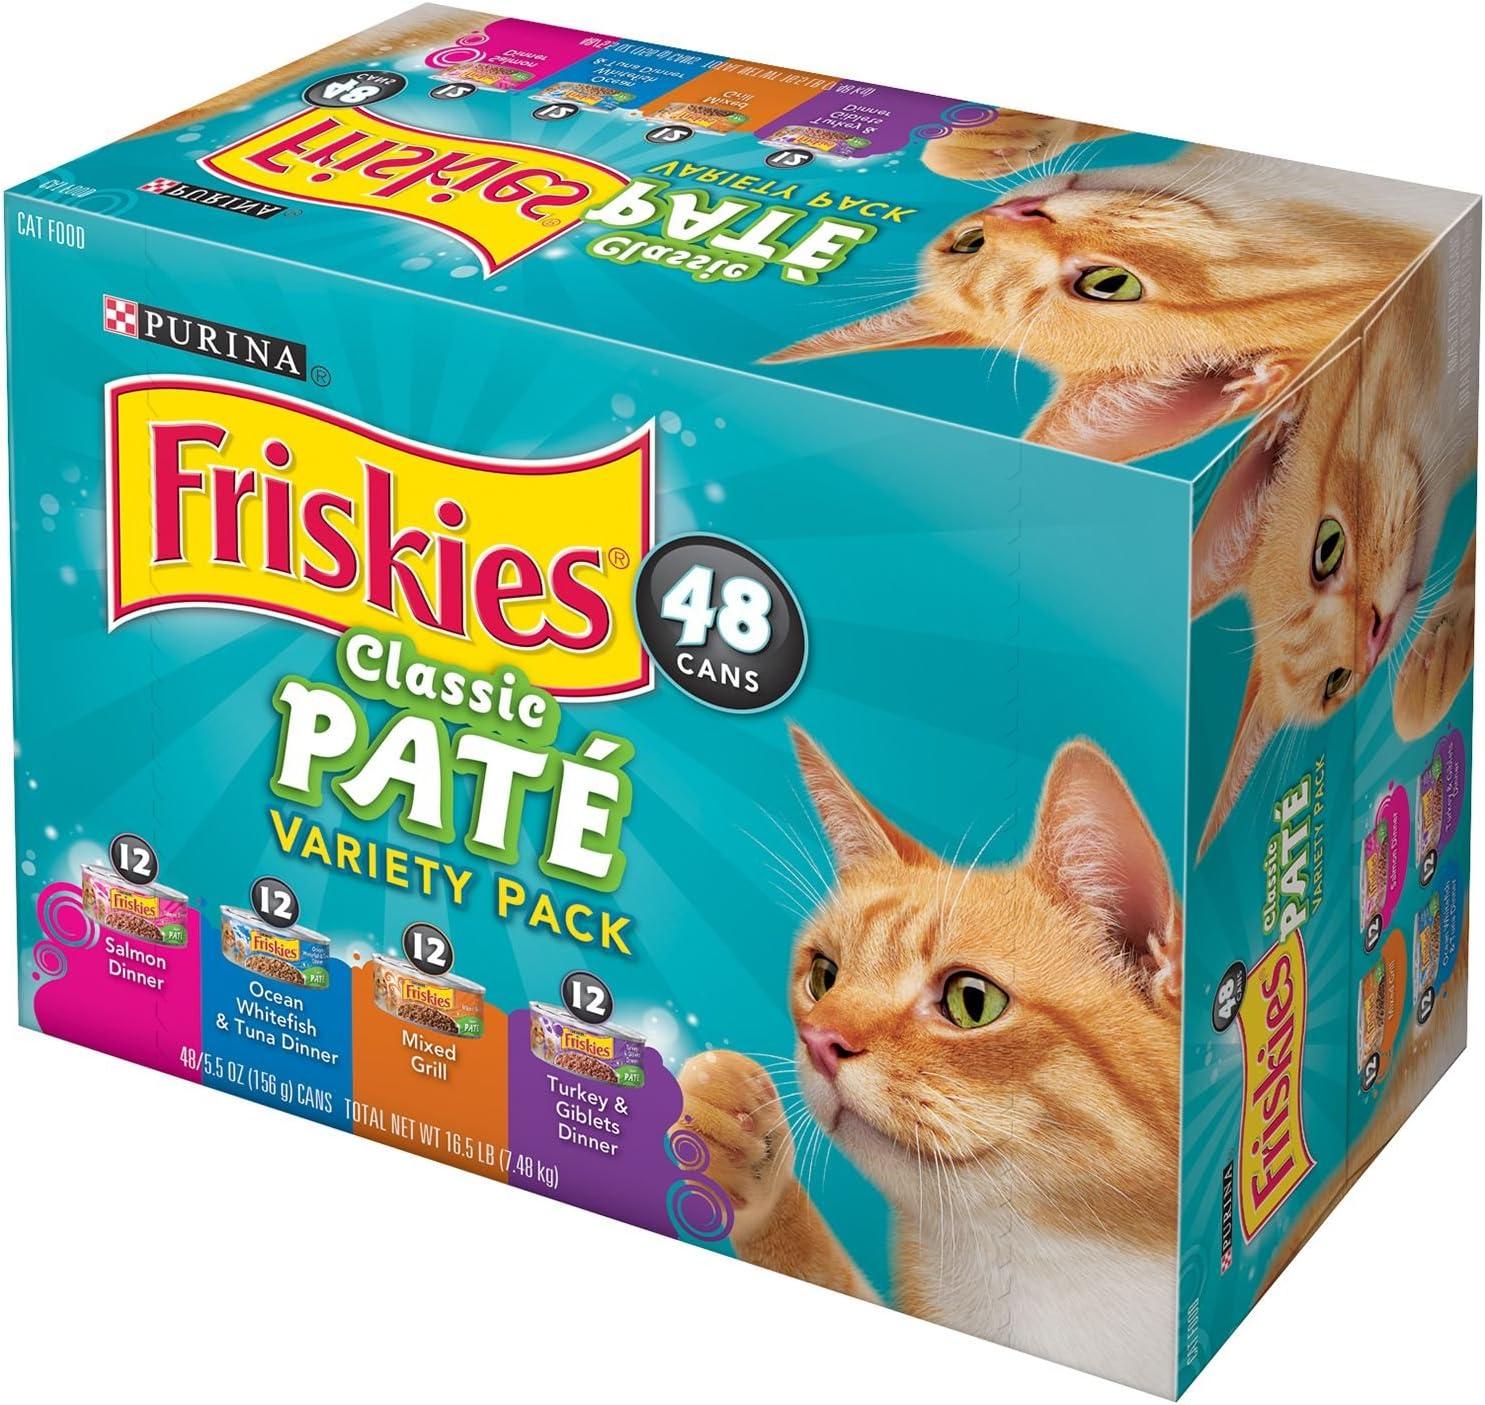 Friskies Purina Classic Pate, Variety Pack (5.5 oz, 48 ct.) (2 Pack)